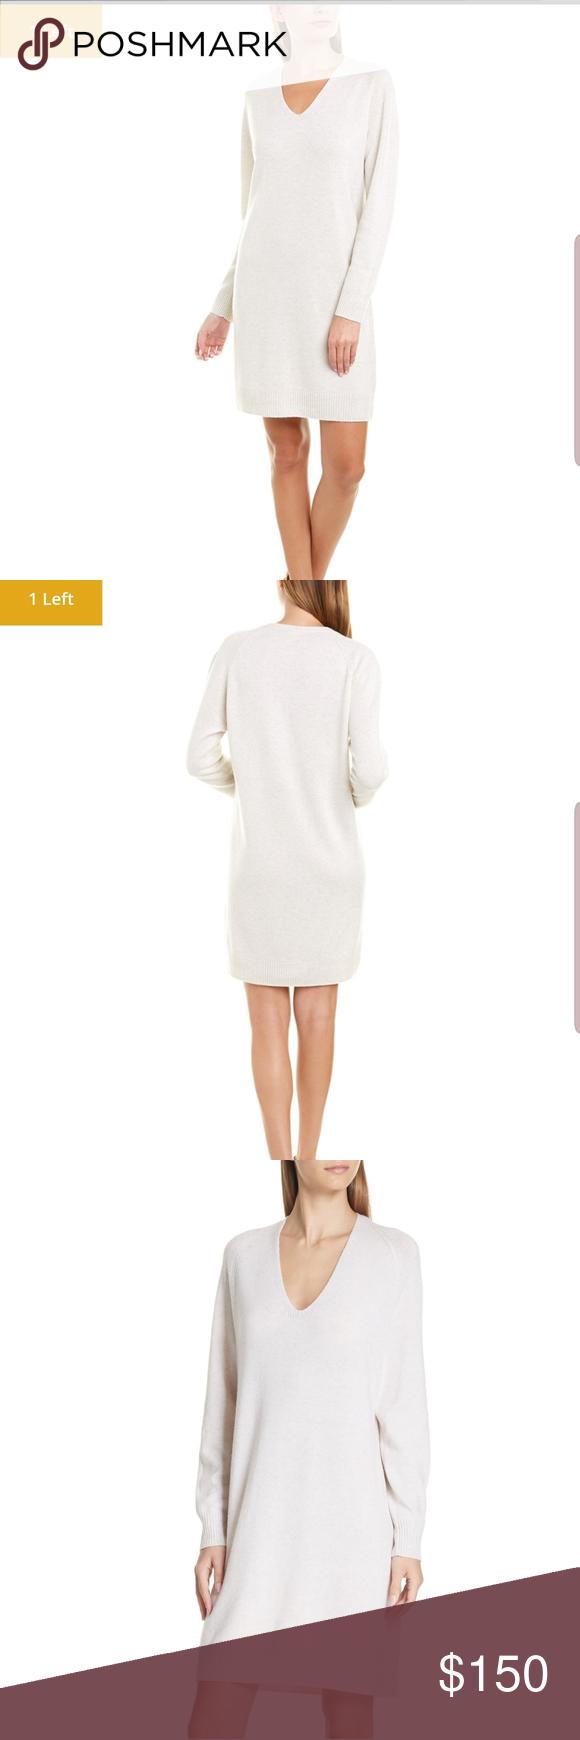 Nwt Vince White Deep V Neck Sweater Dress Sweater Dress Vneck Sweater Neck Sweater [ 1740 x 580 Pixel ]